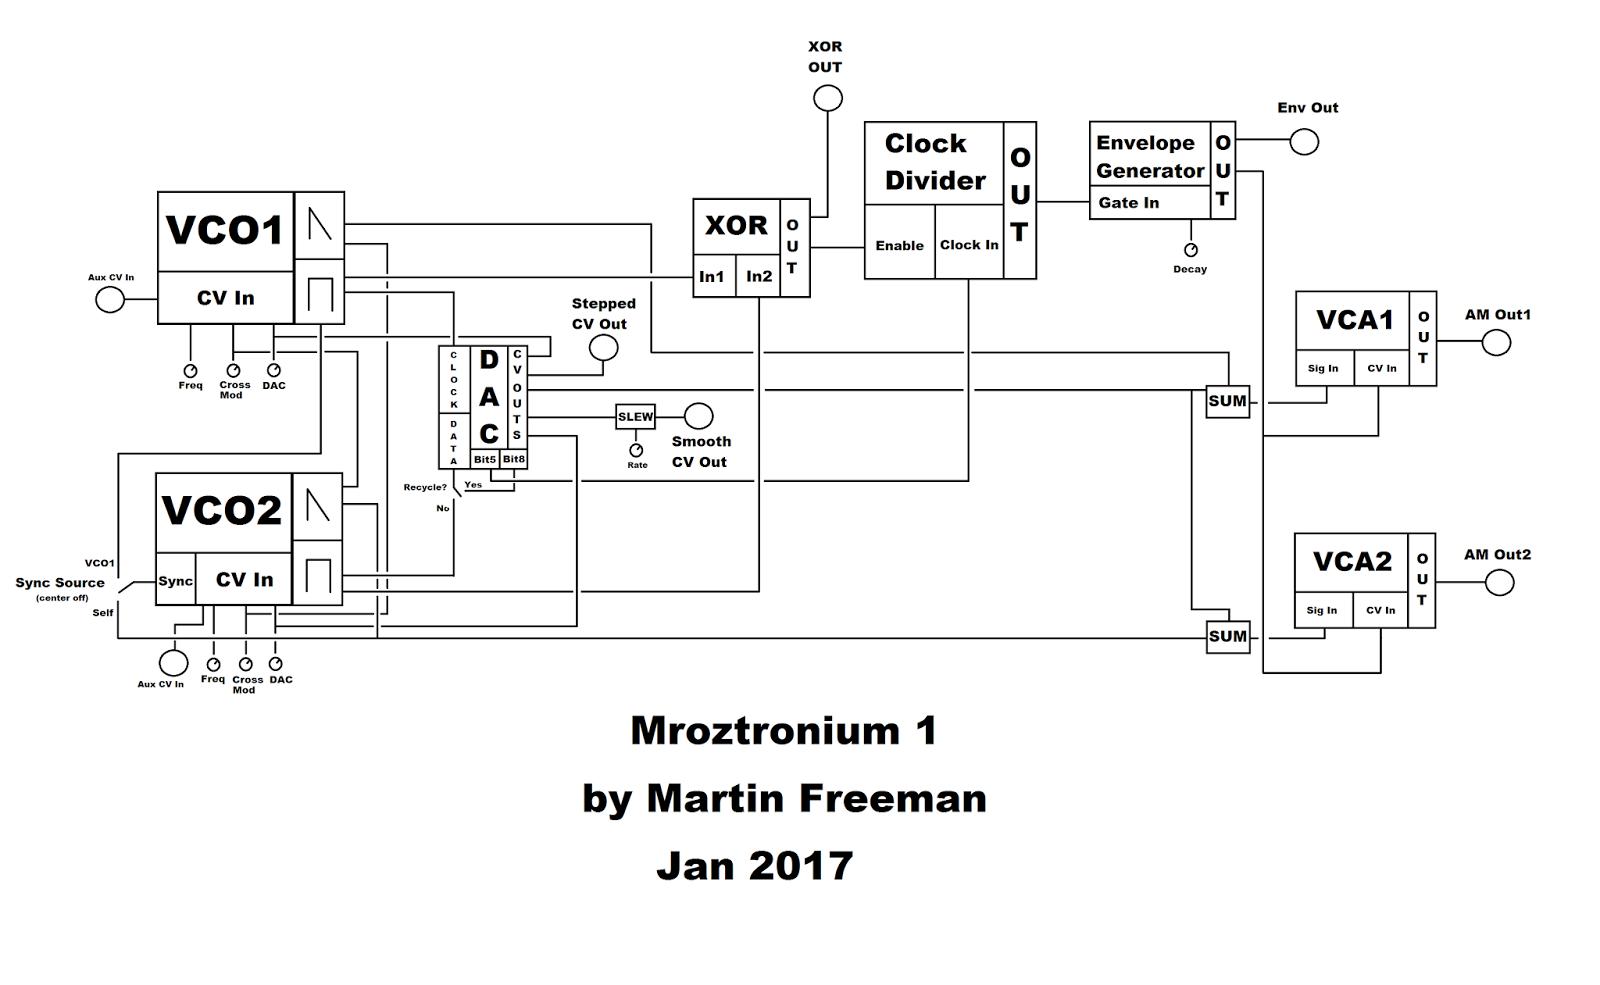 mroztronium  mroztronium 1